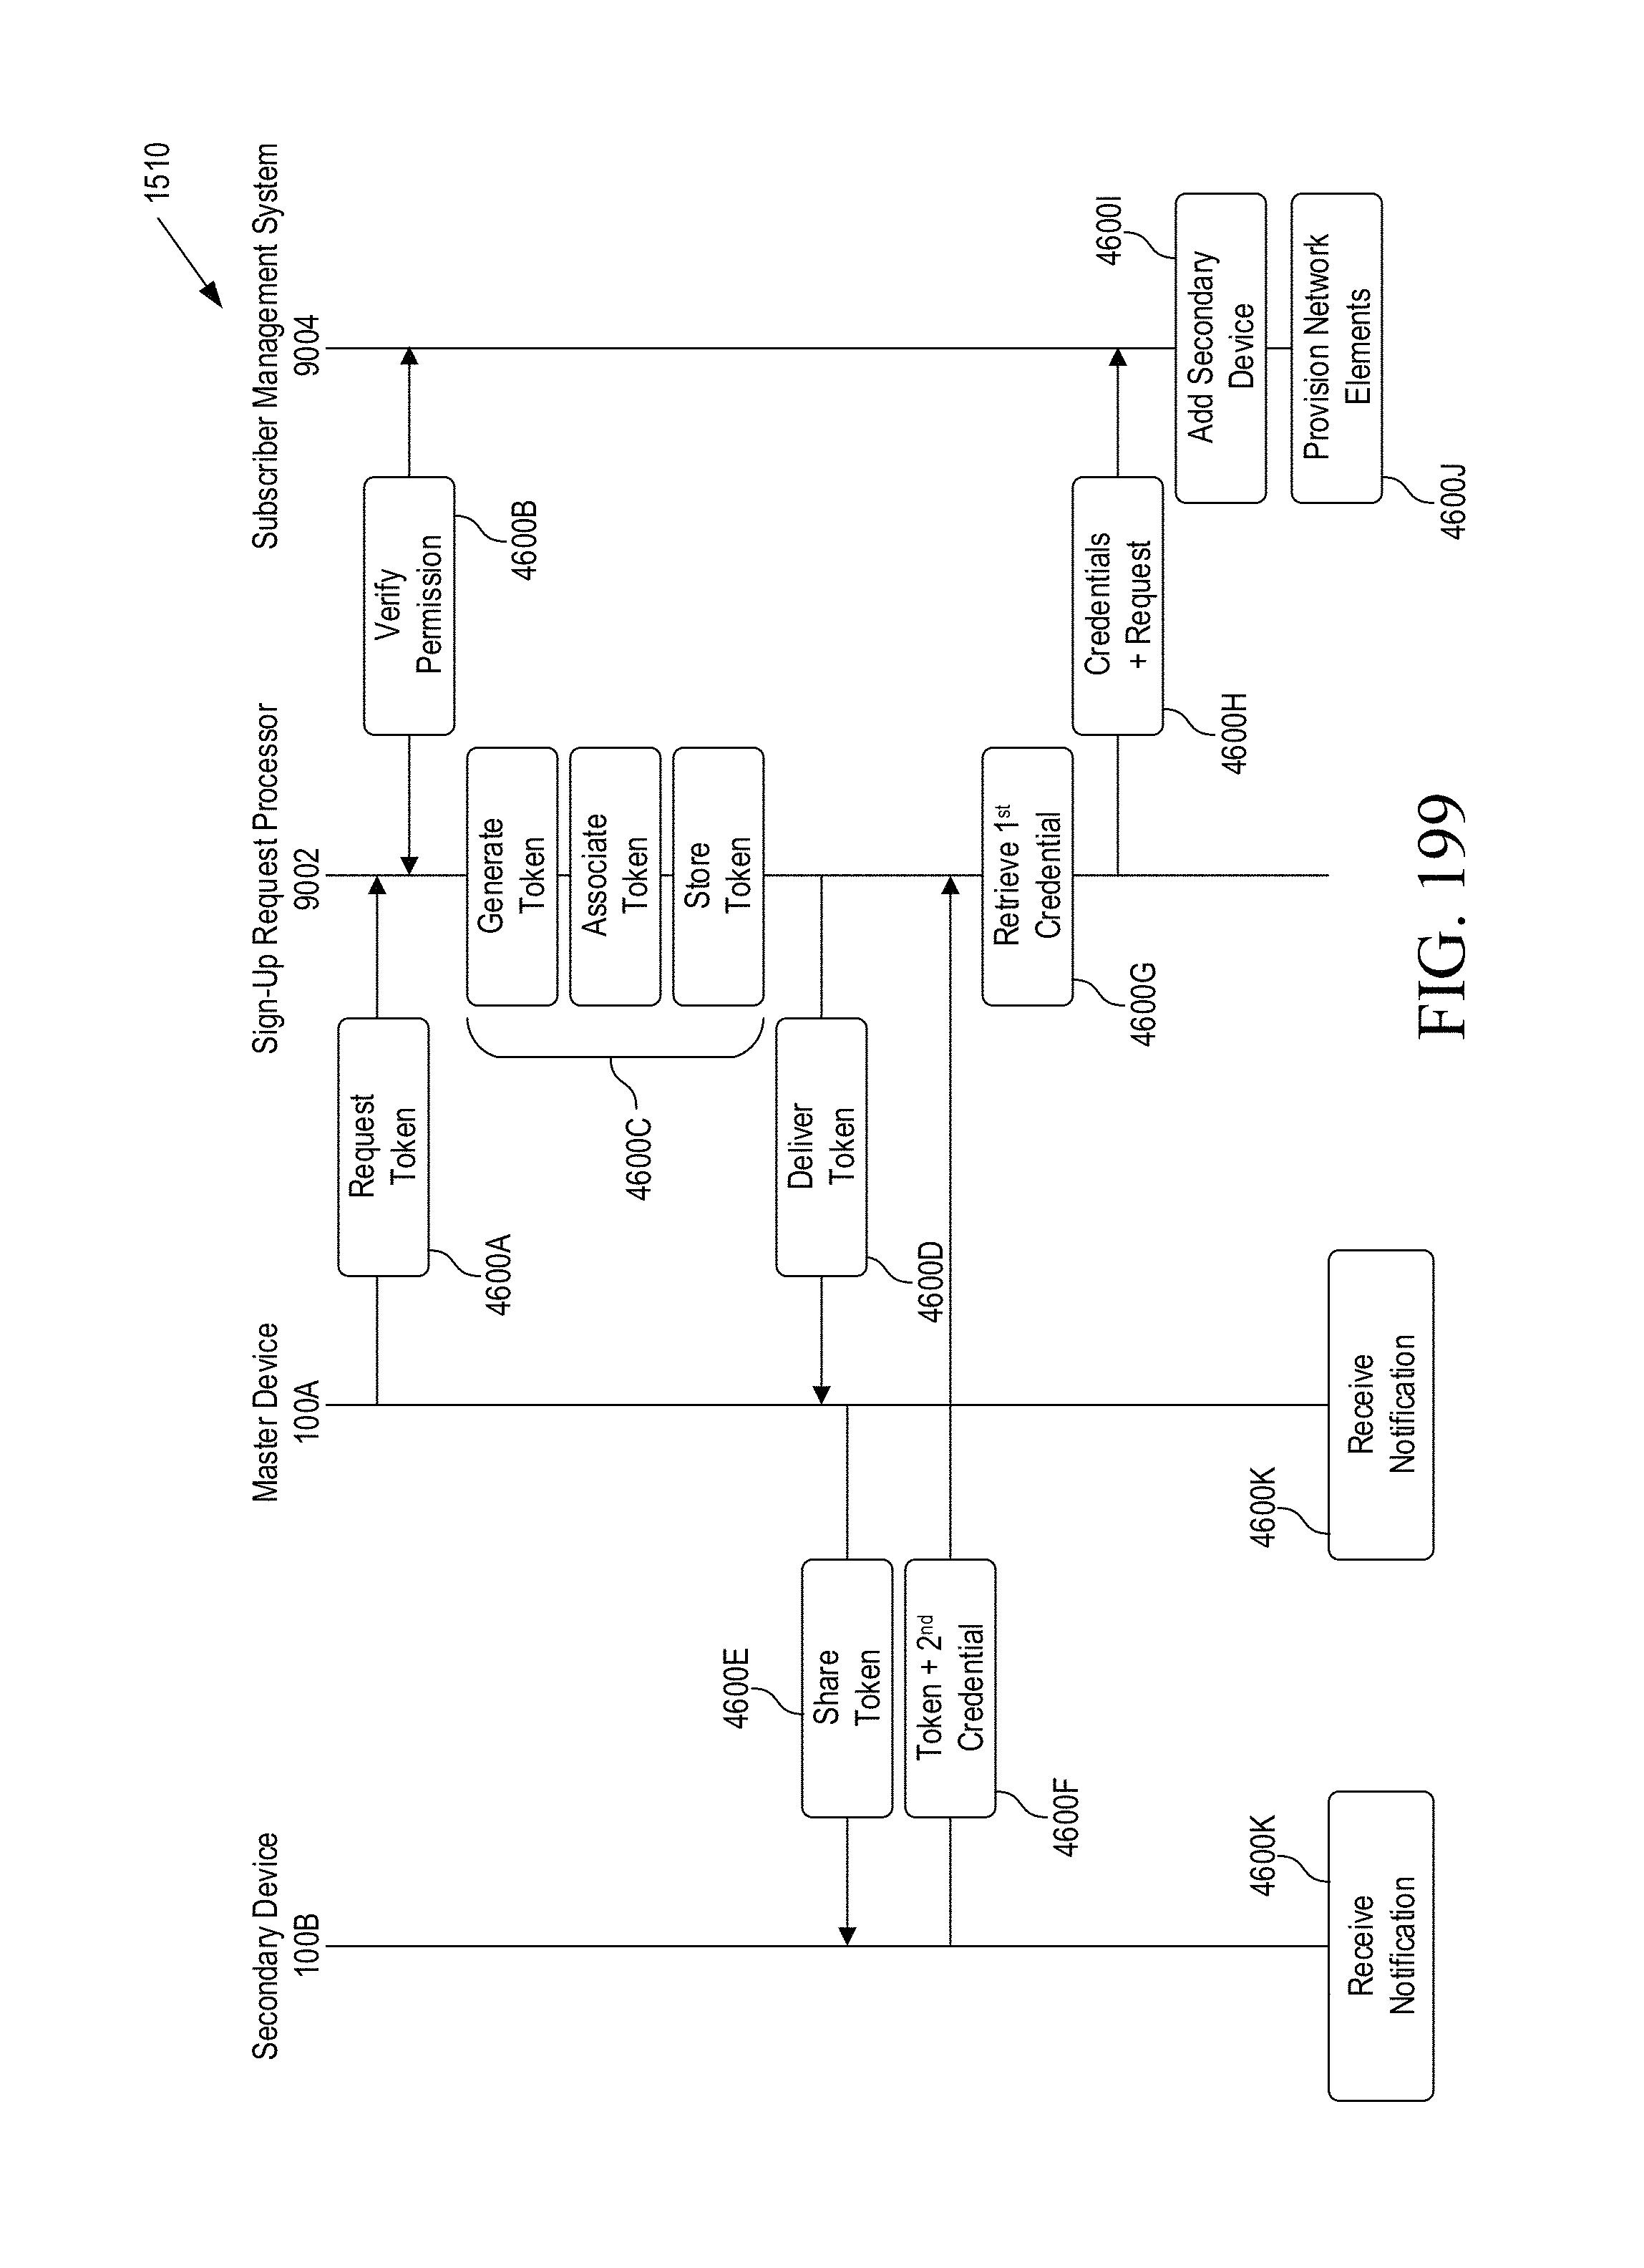 circuit diagram hqew net all wiring diagram Simple Circuit